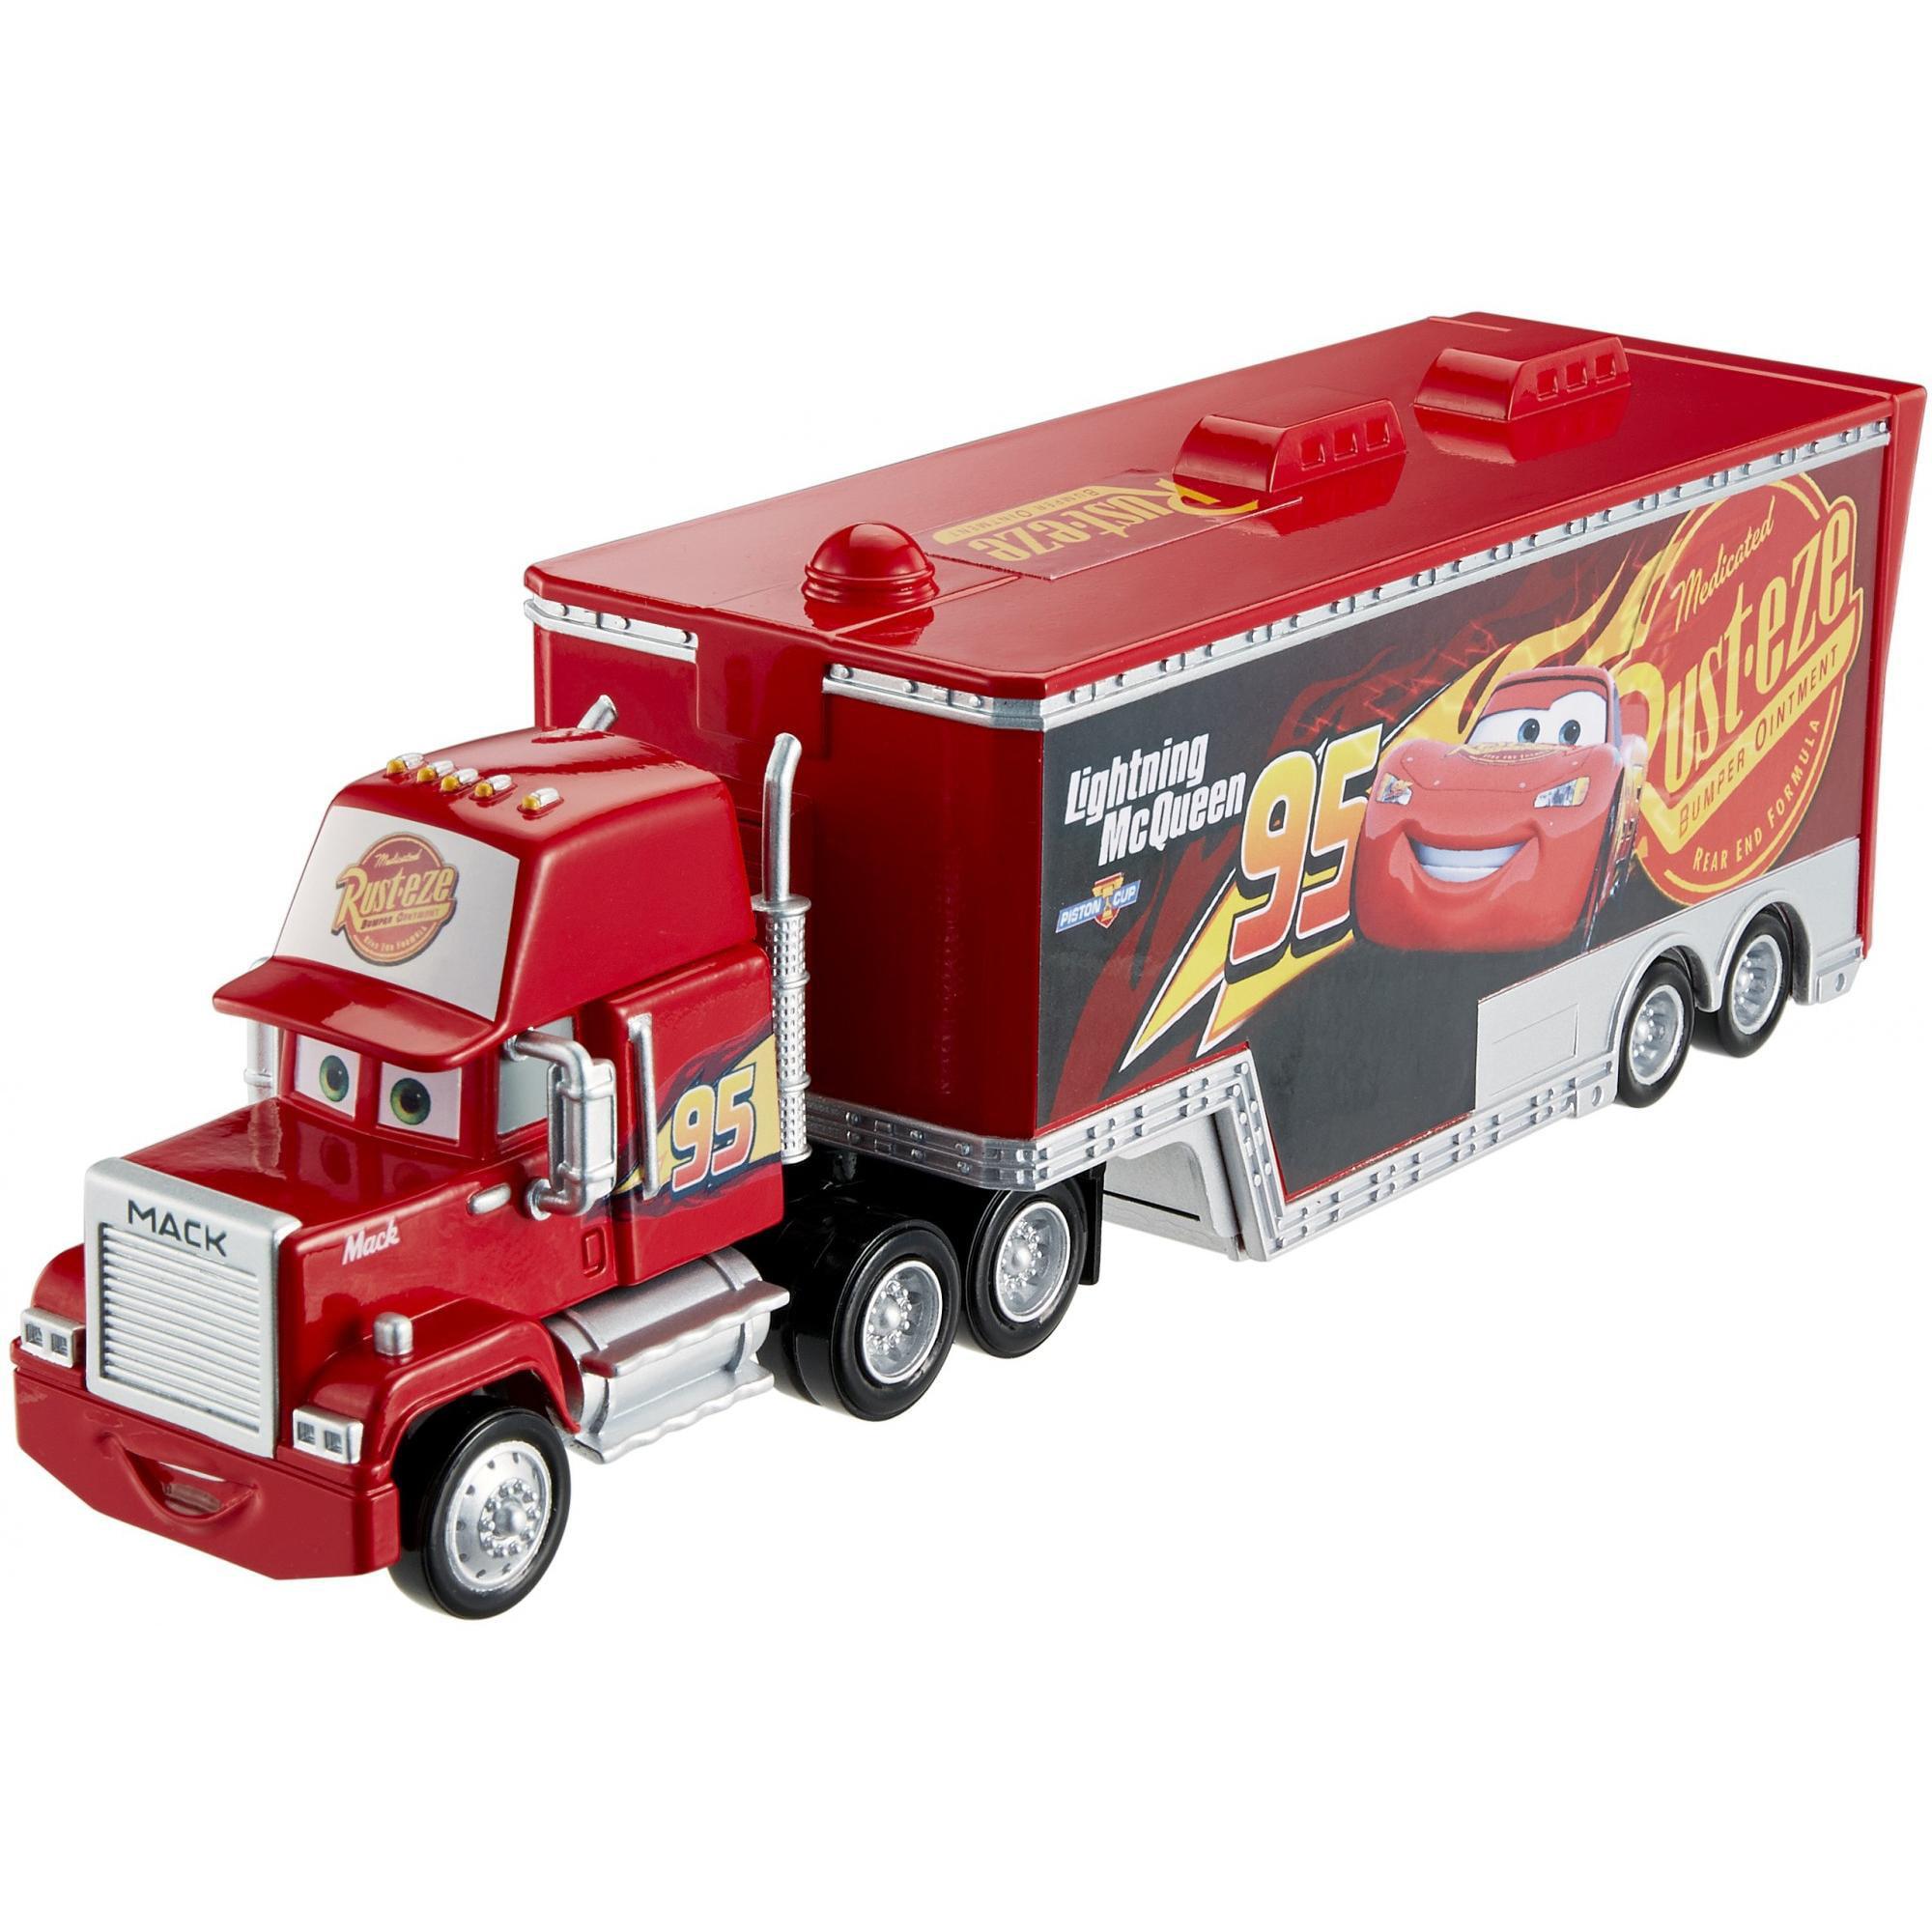 Disney Pixar Cars 3 Mack Hauler Die Cast Character Vehicle